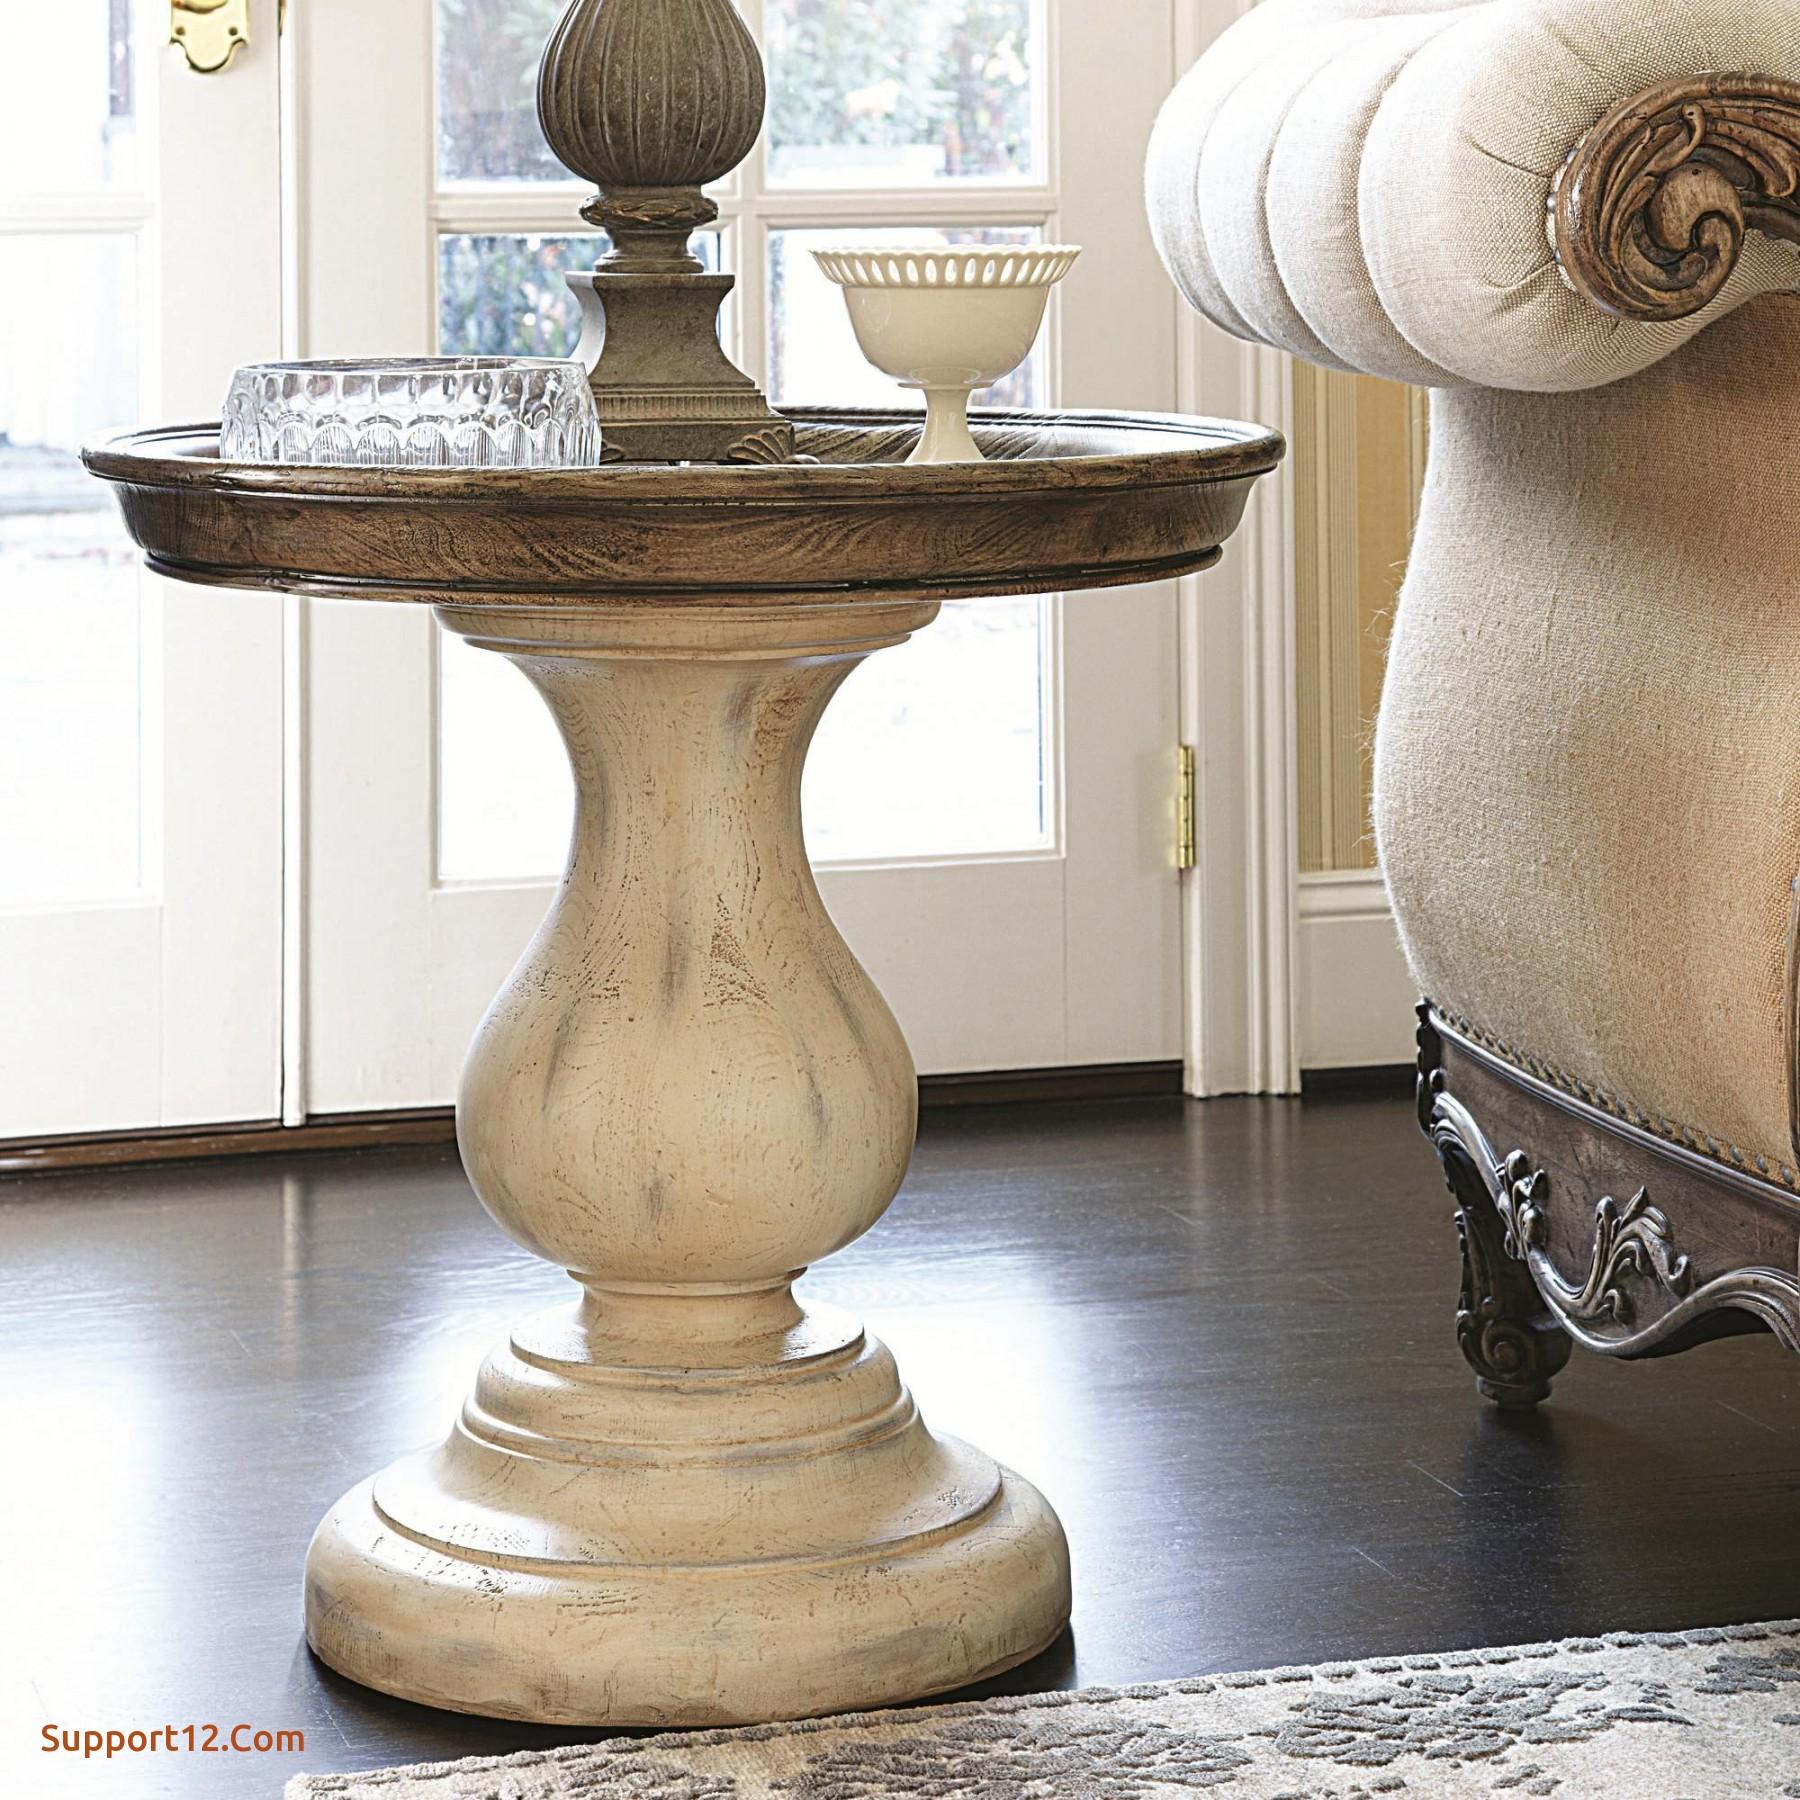 tabletop pedestal inspirational furniture inspiring black round accent table bedside oriental desk lamp blue mosaic garden large chair circular outdoor windsor fabric placemats